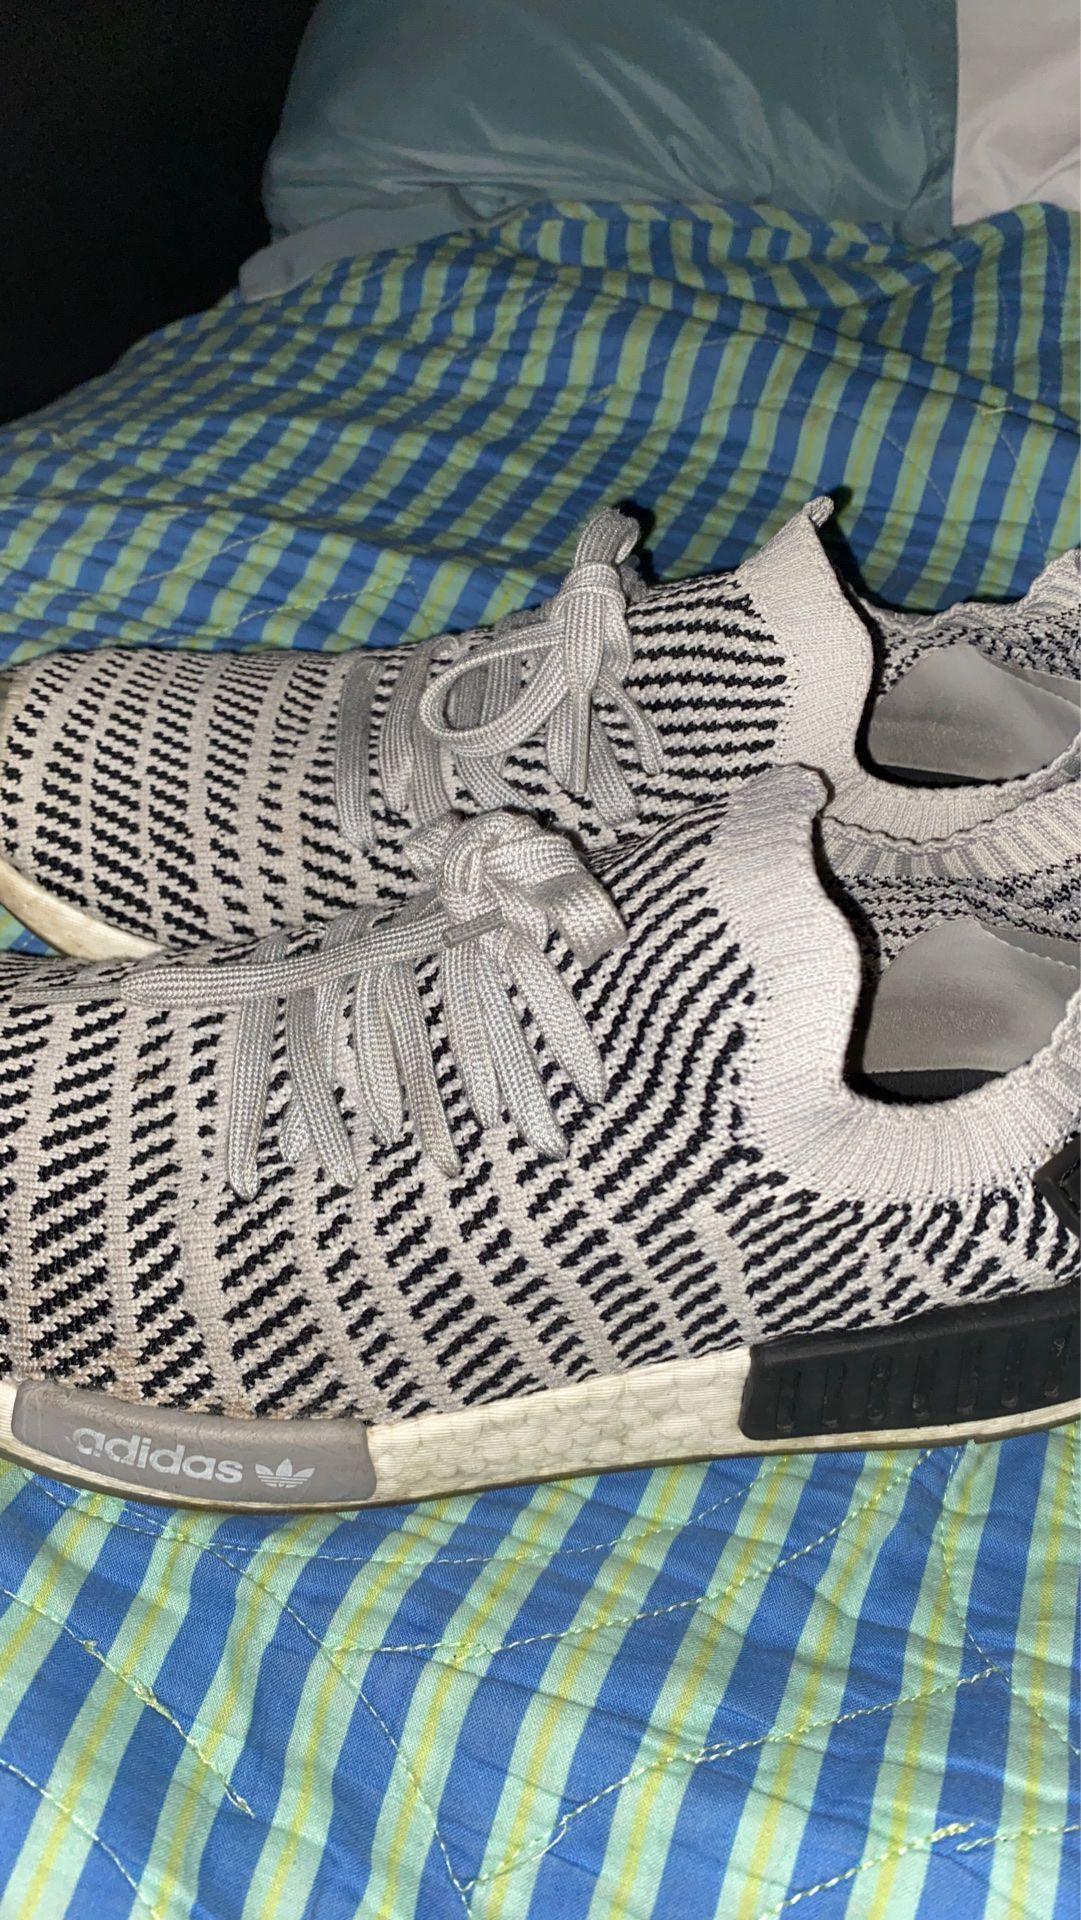 Adidas NMD_R1 Grey primeknit Size 11